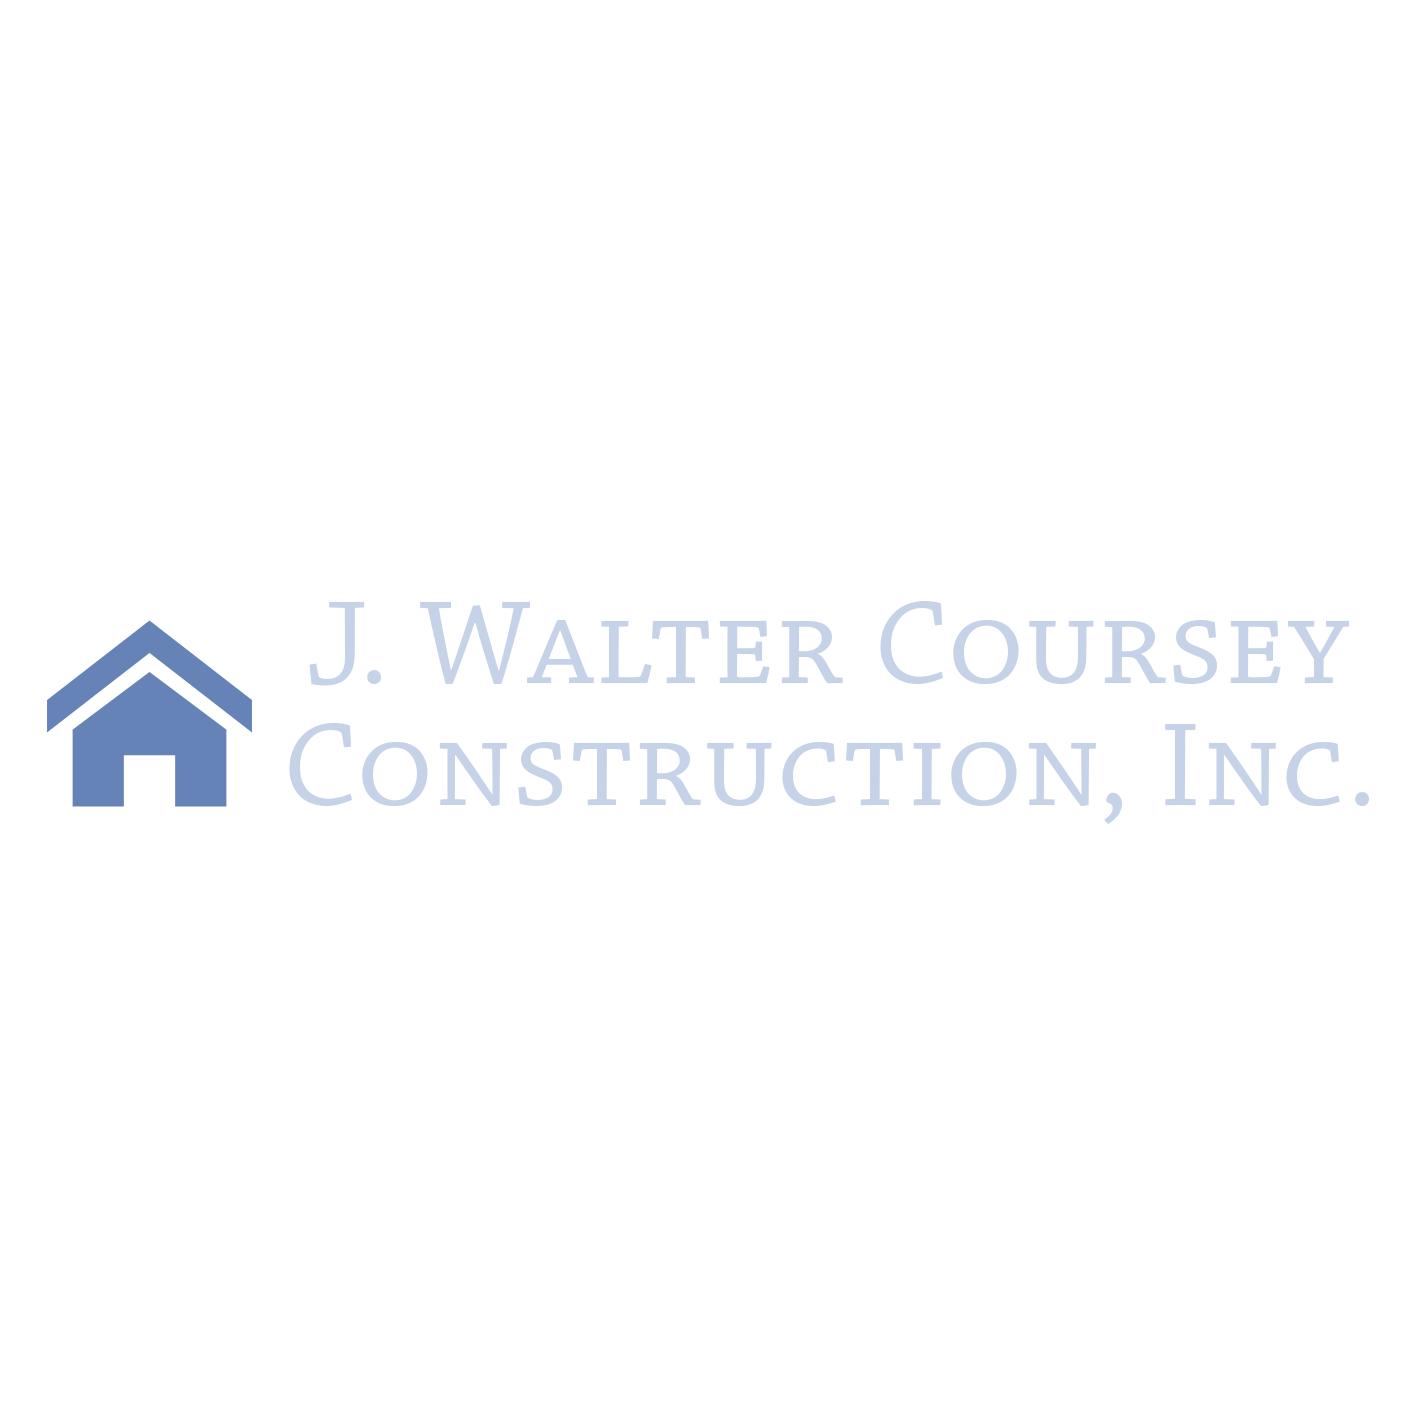 J. Walter Coursey Construction, Inc.